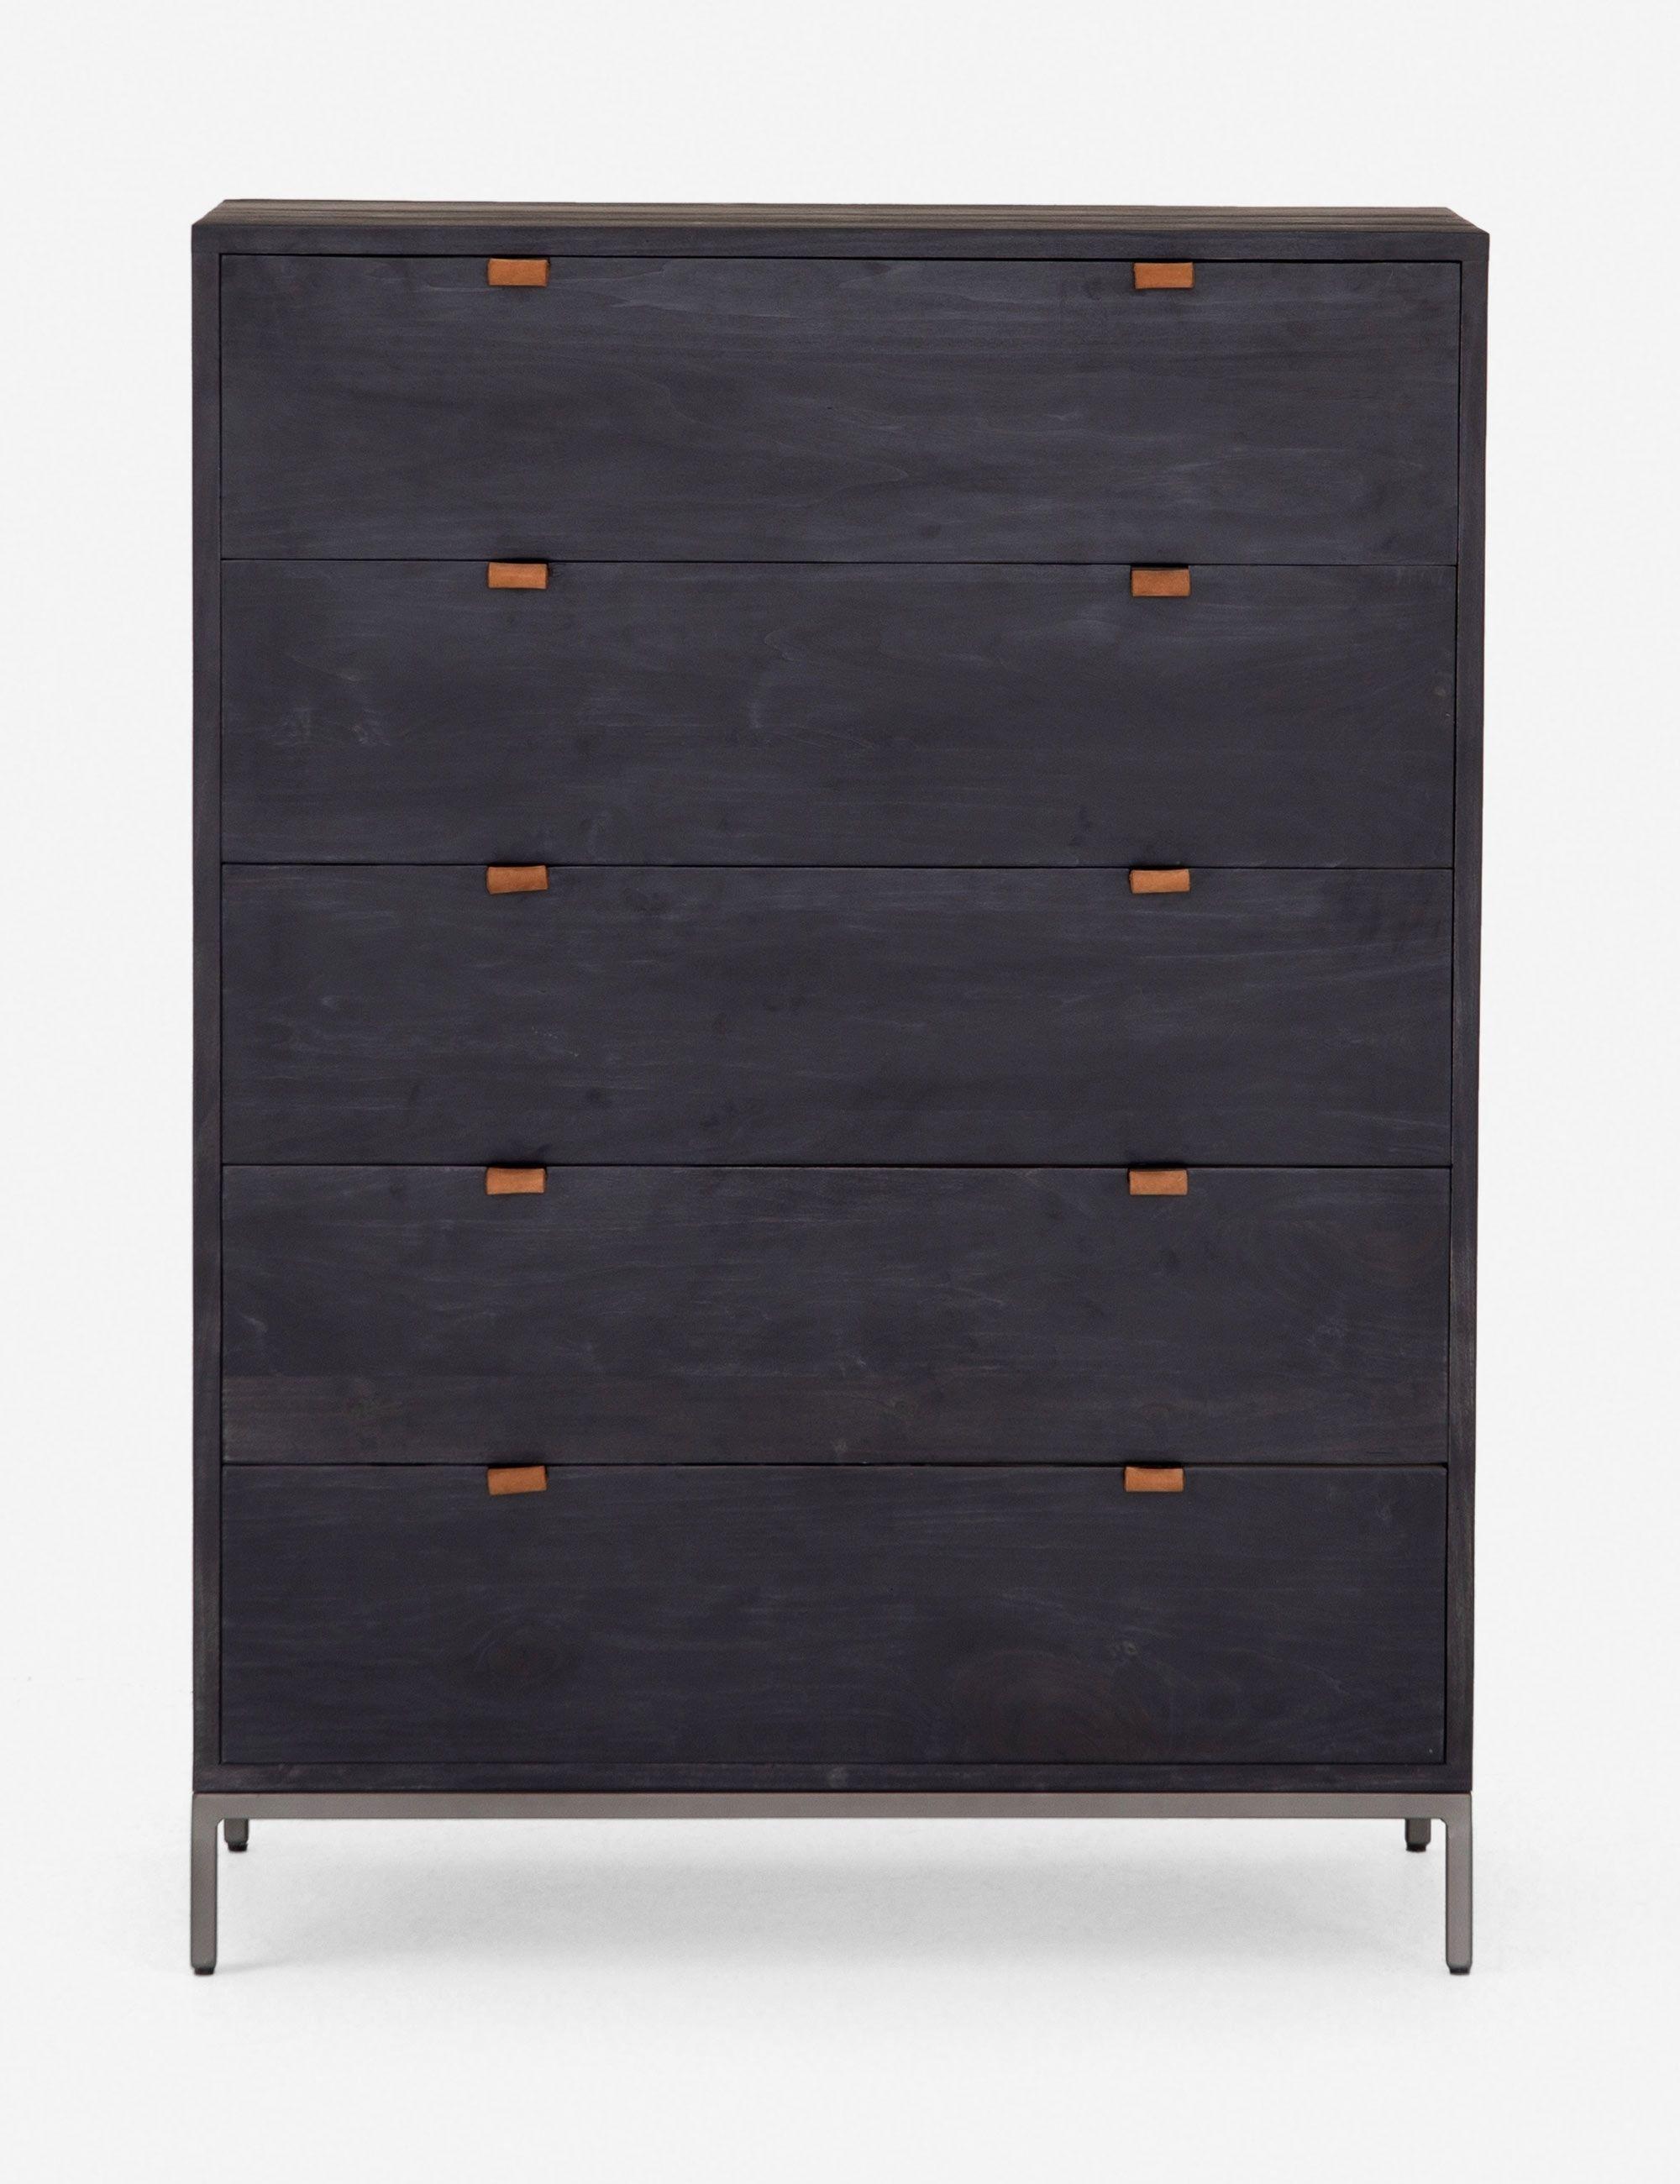 Rosamonde 5 Drawer Dresser Wooden Dresser 5 Drawer Dresser Drawers [ 2600 x 2000 Pixel ]